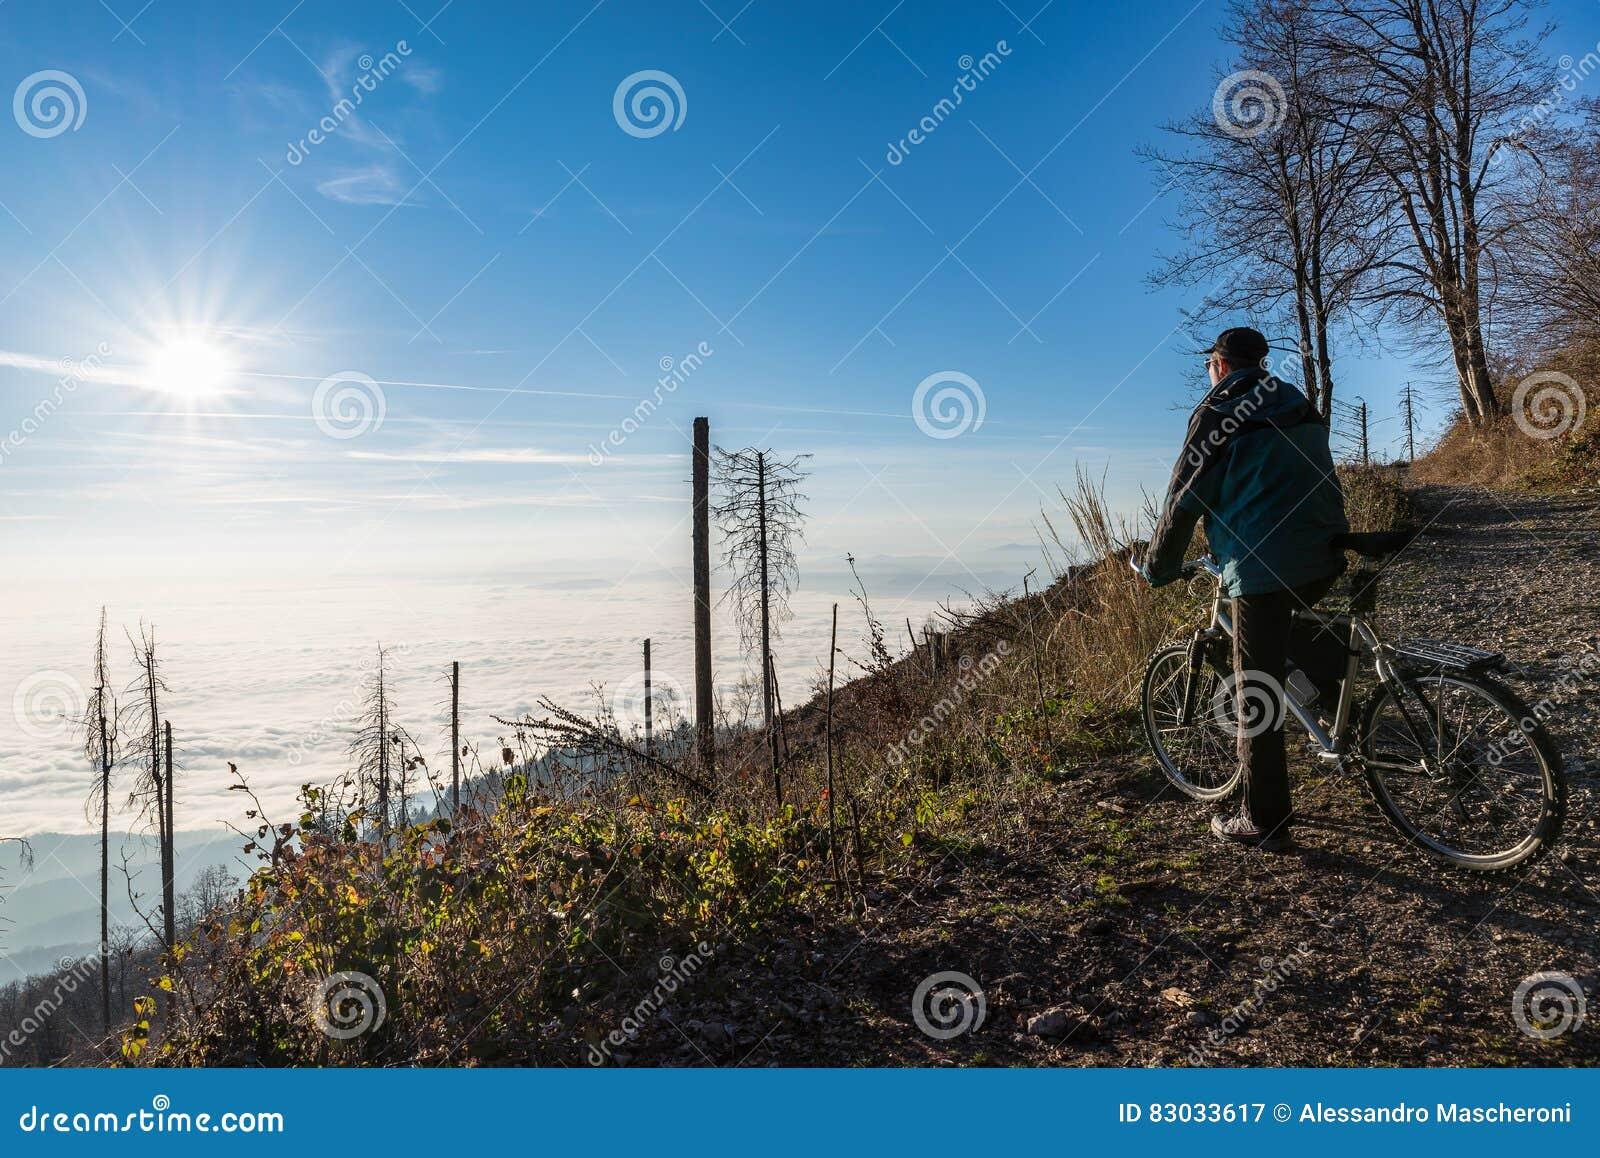 Ciclista con la bici de montaña, dei Fiori Varese, Italia de Campo del parque